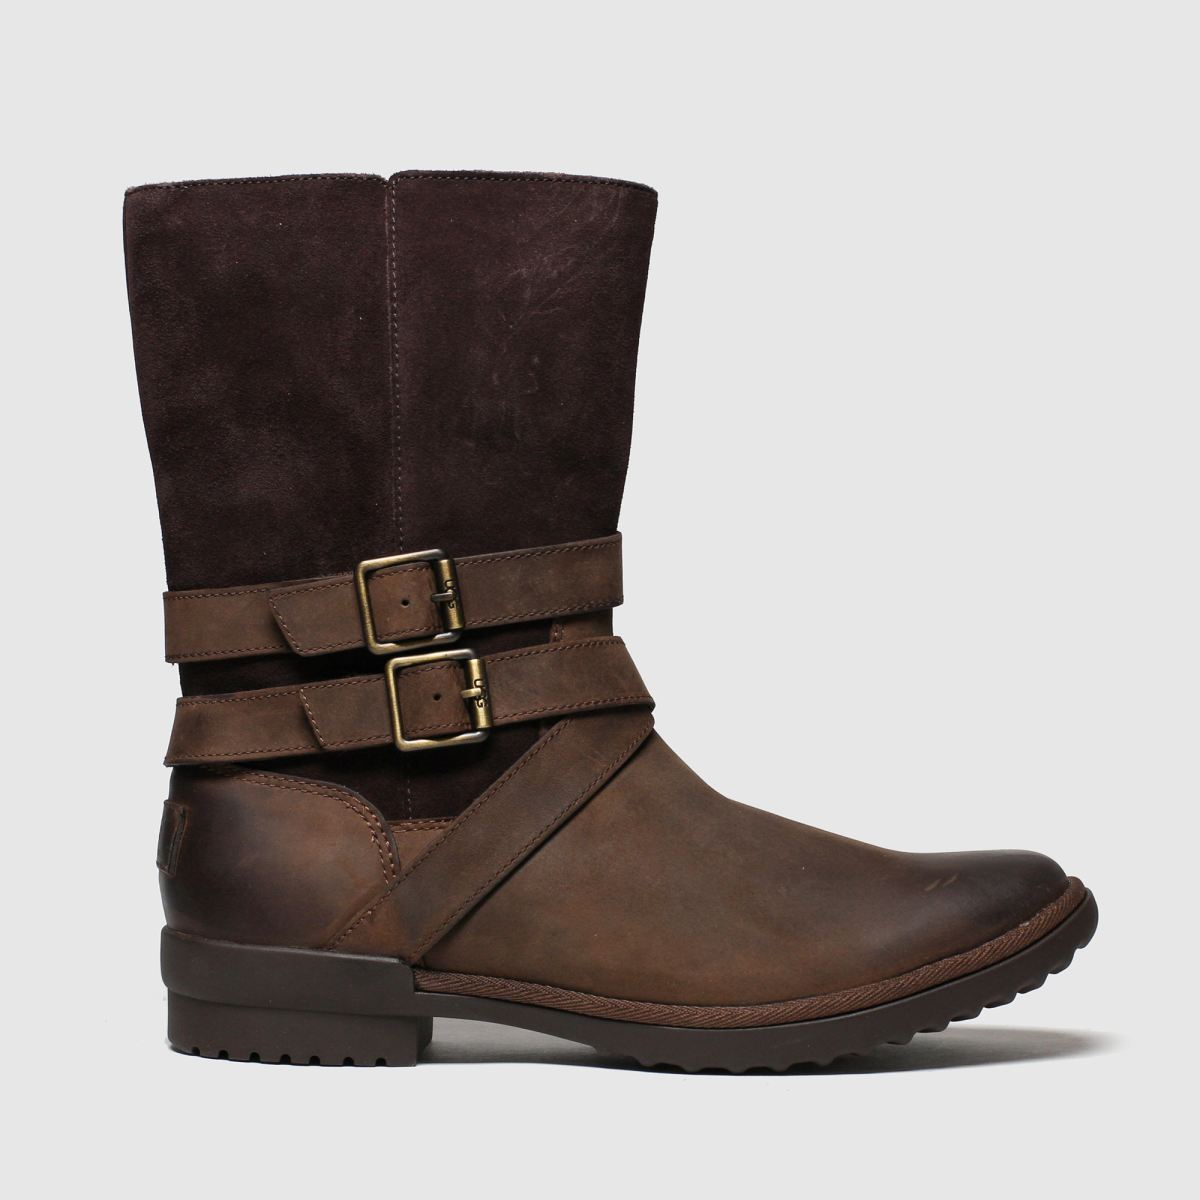 Ugg Brown Lorna Boots